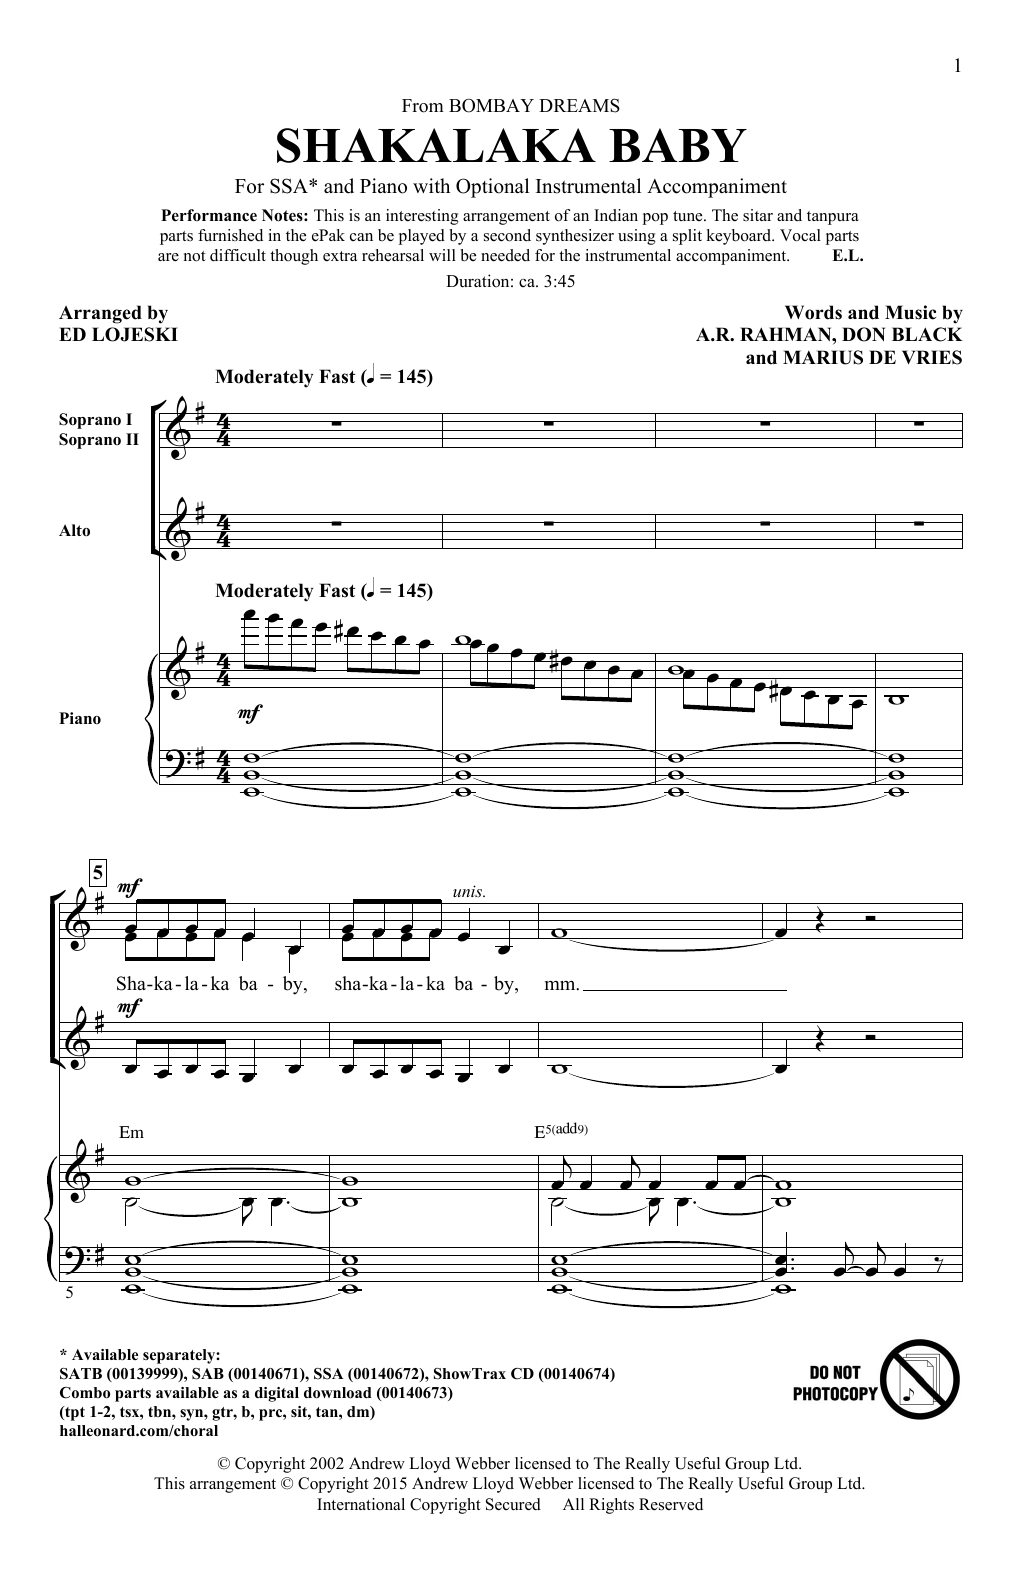 Partition chorale Shakalaka Baby (from Bombay Dreams) (arr. Ed Lojeski) de A. R. Rahman - SSA